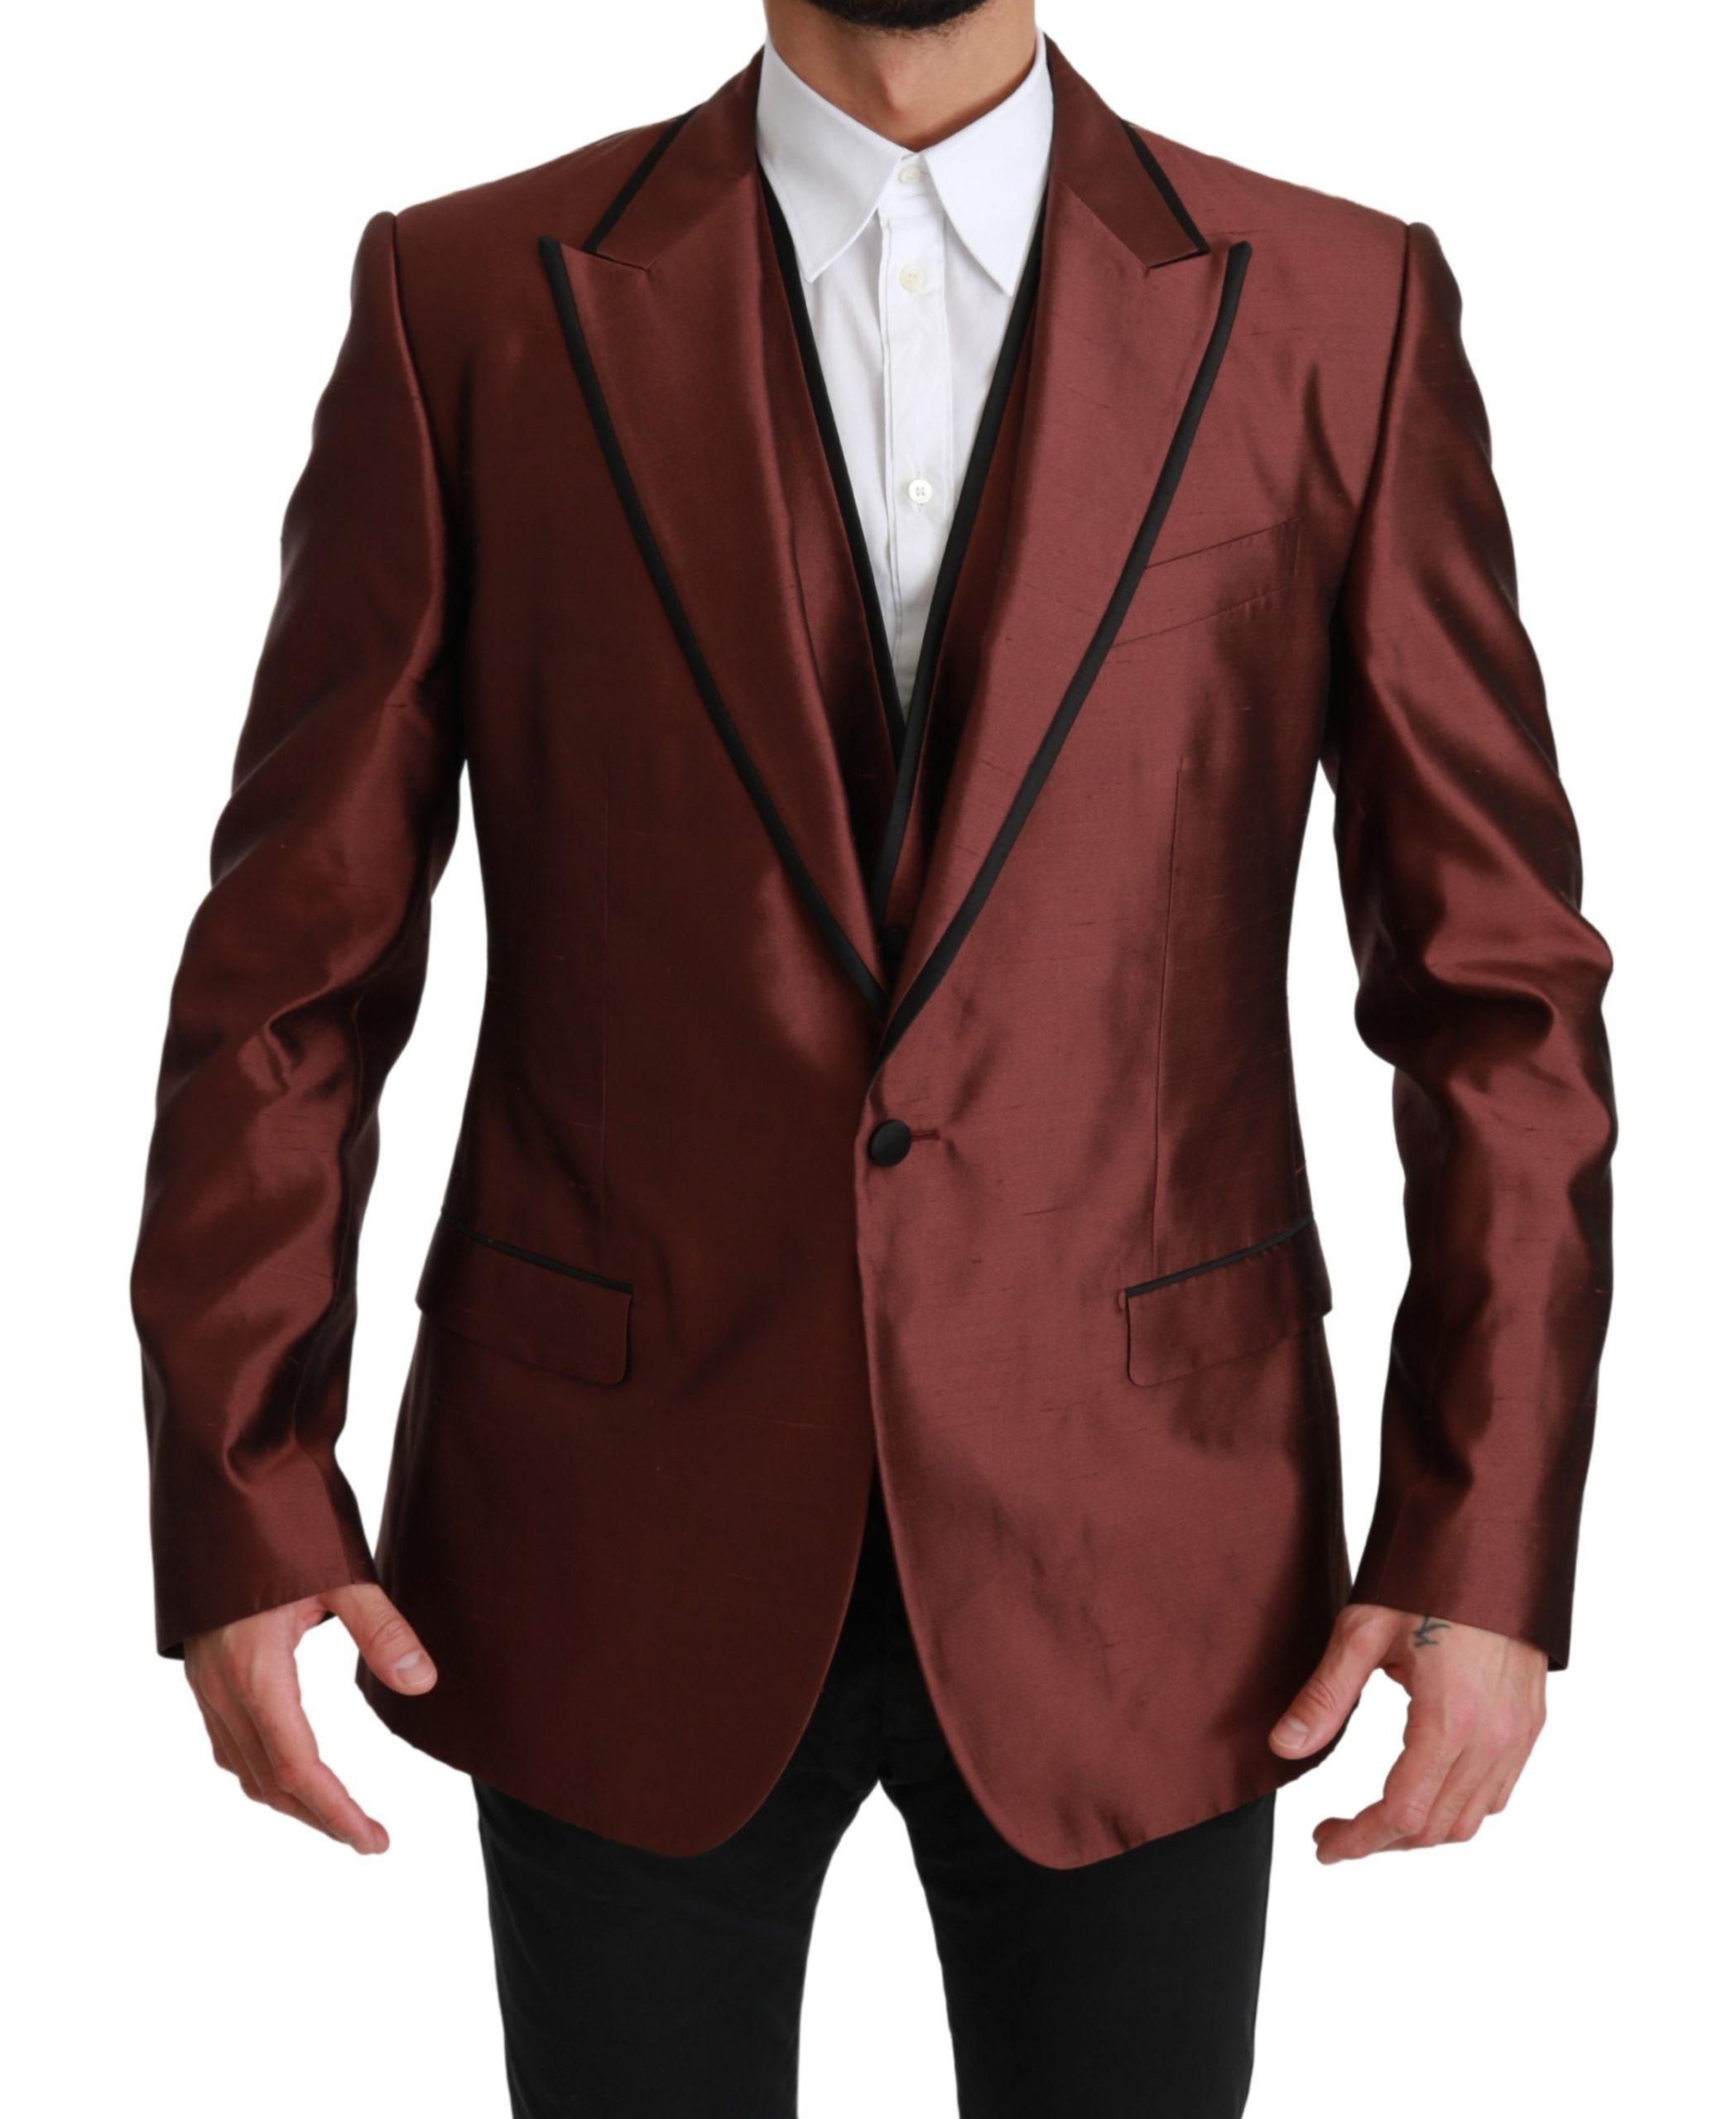 Dolce & Gabbana Men's Silk Vest 2 Piece Blazer Bordeaux KOS1663 - IT52   XL